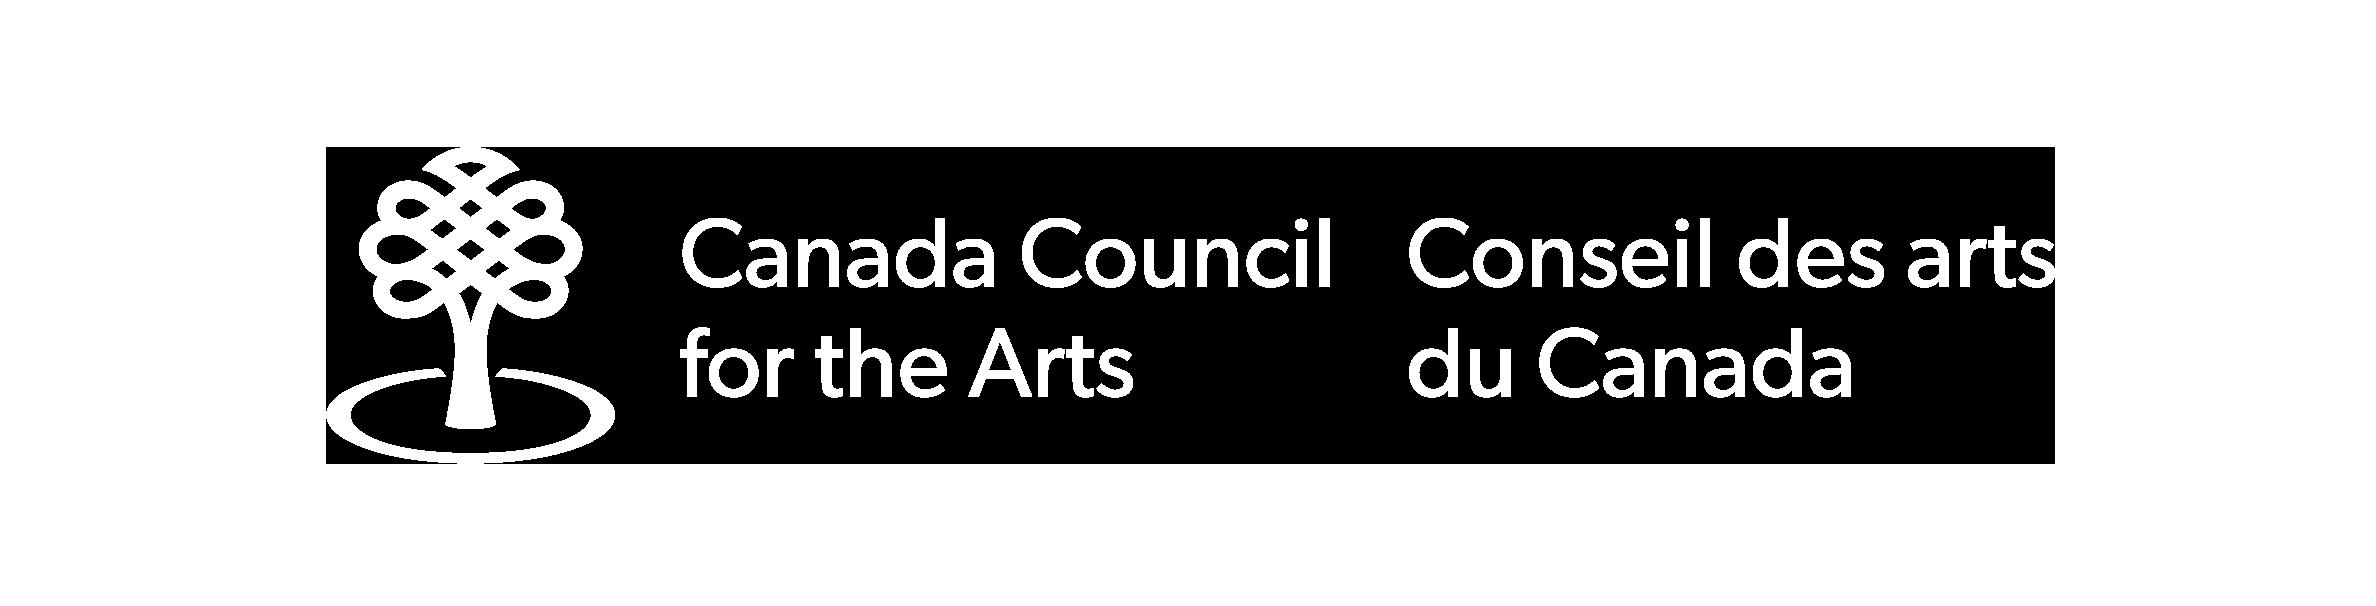 cca-logo-2.png